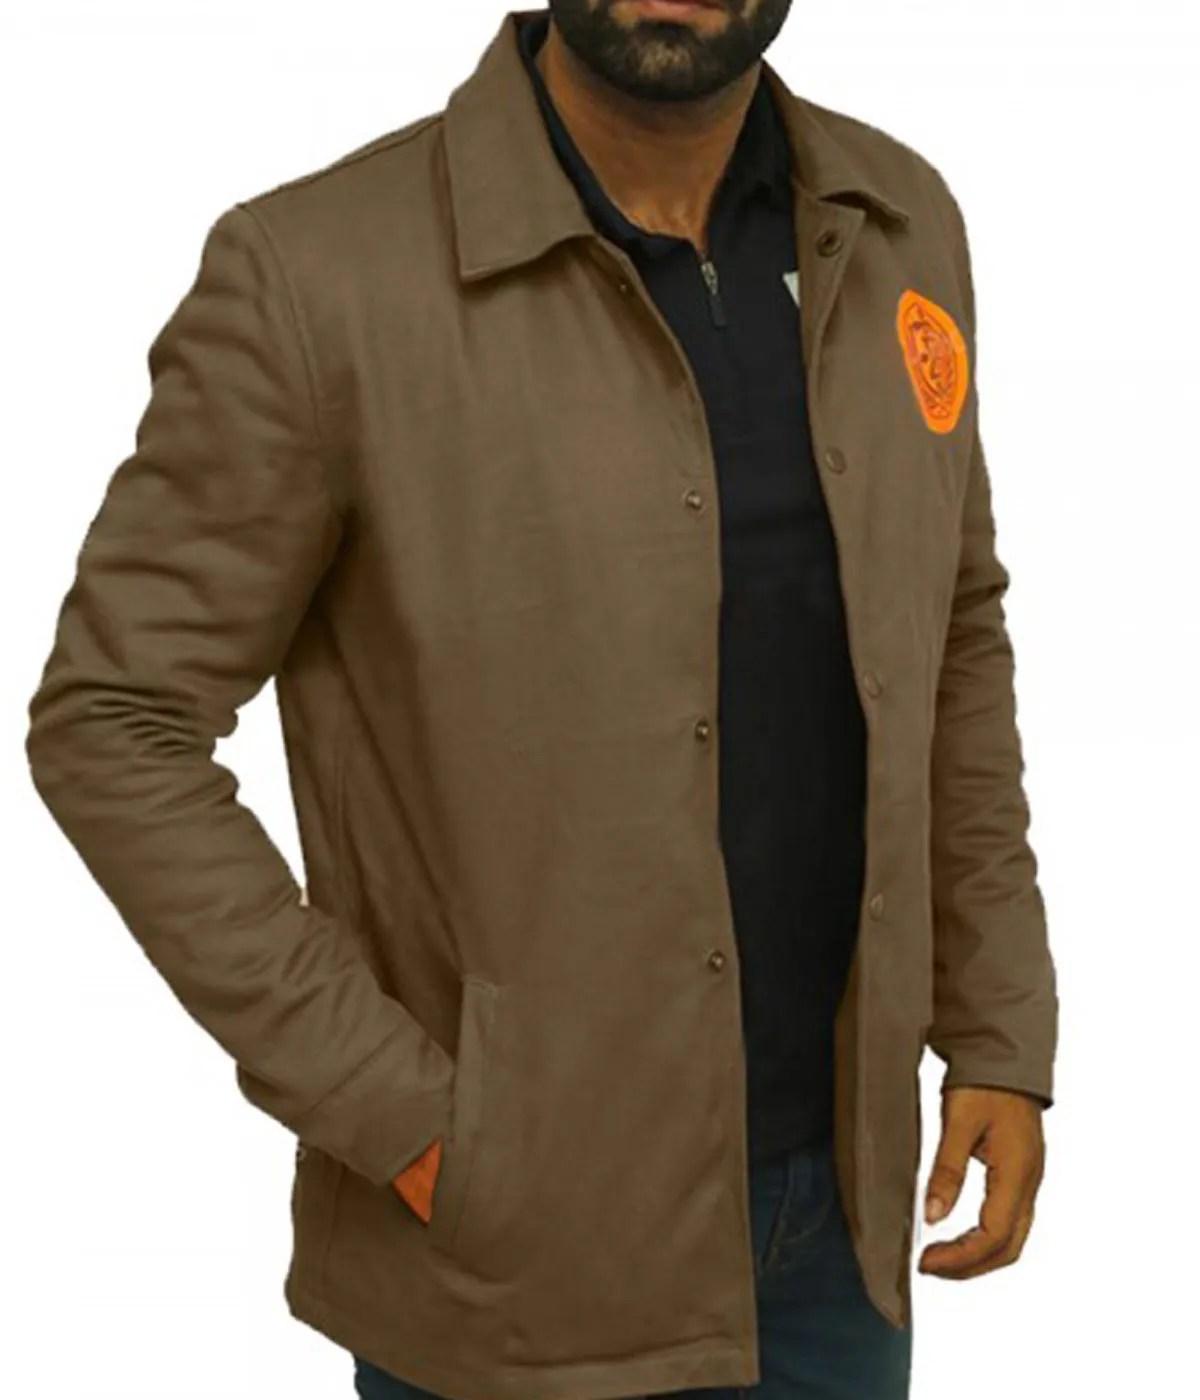 tom-hiddleston-loki-brown-cotton-jacket